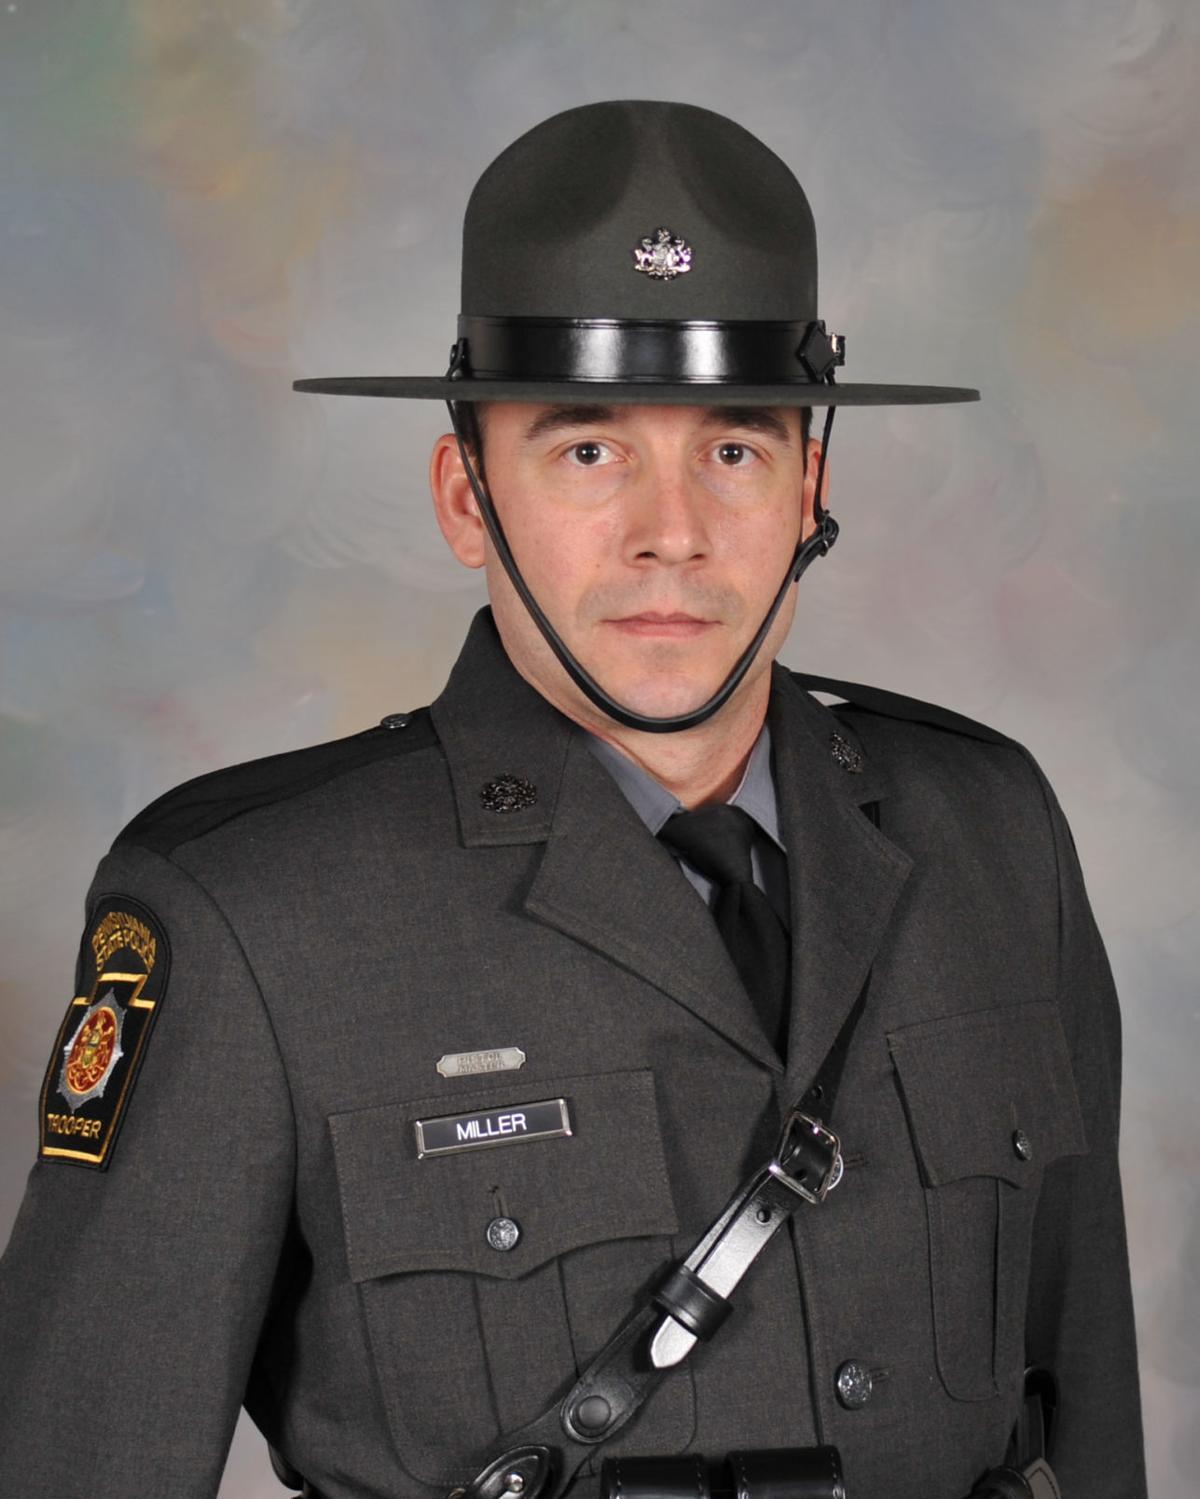 State police graduates